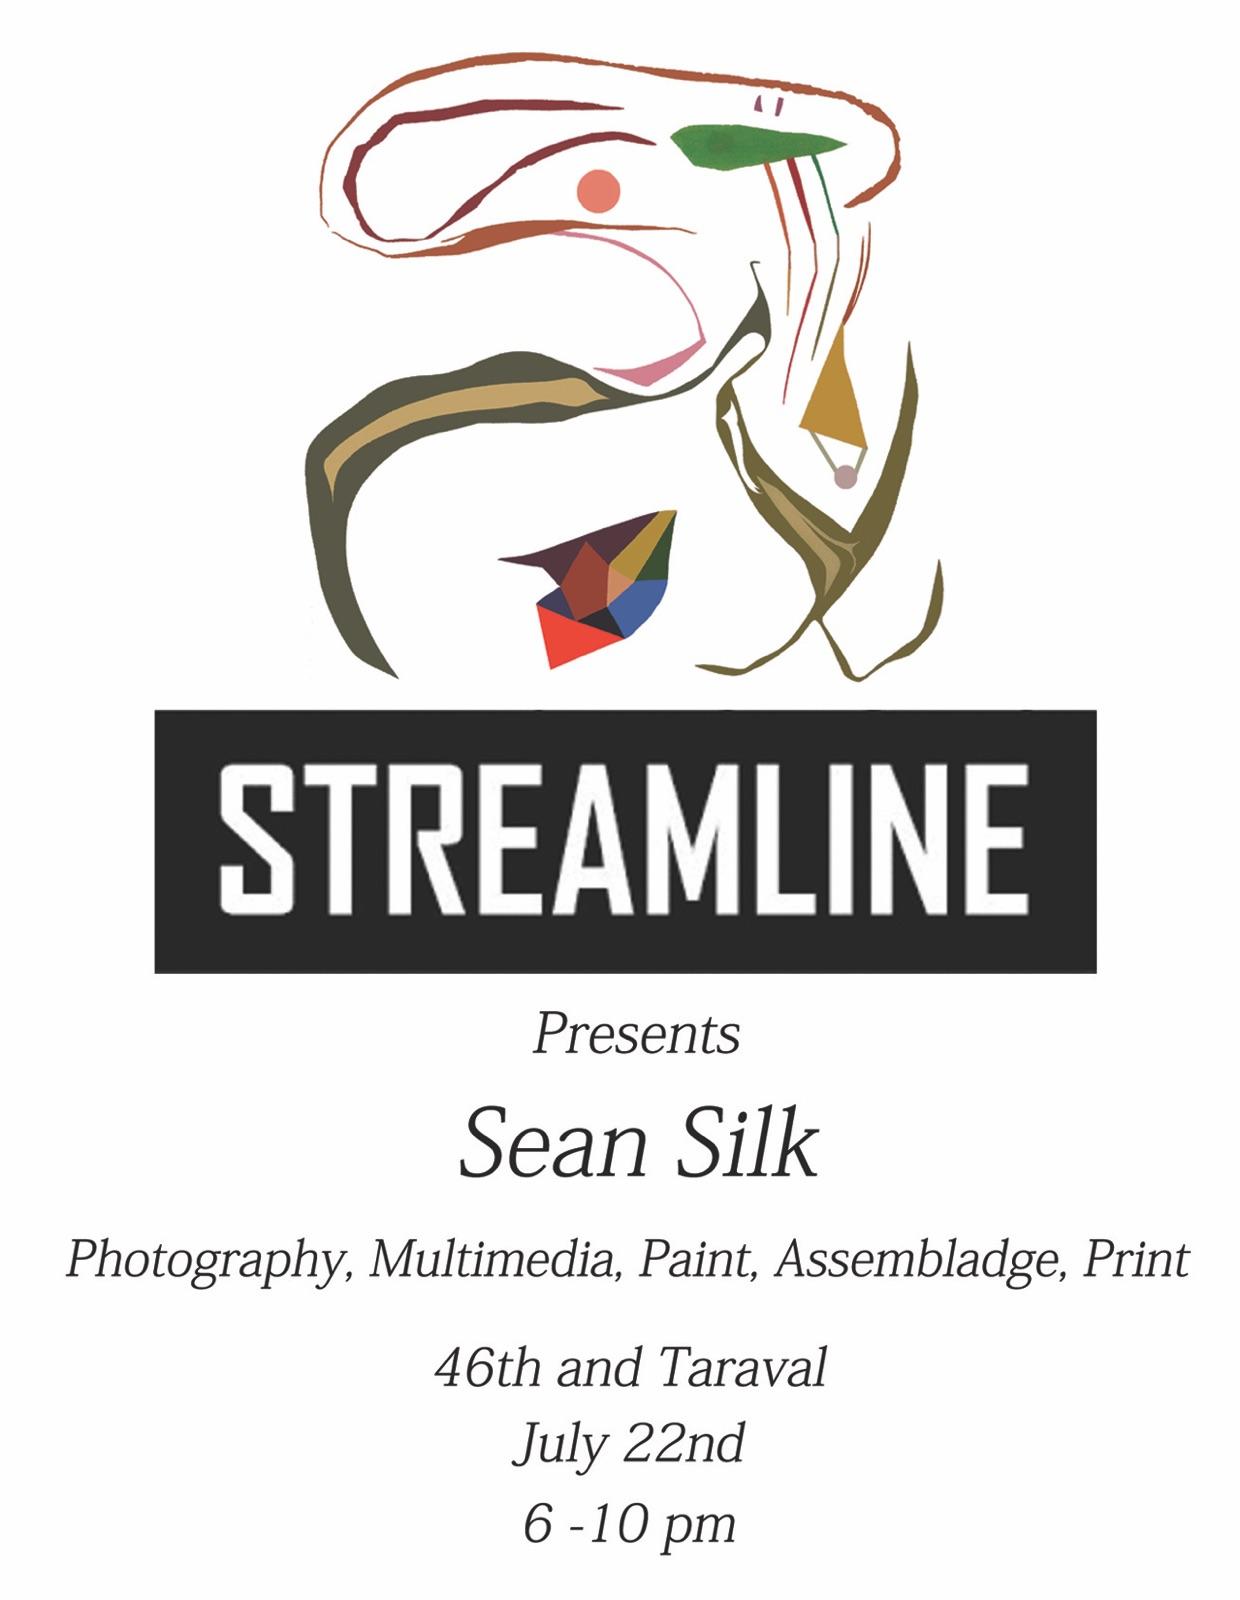 Sean Silk flyer.JPG